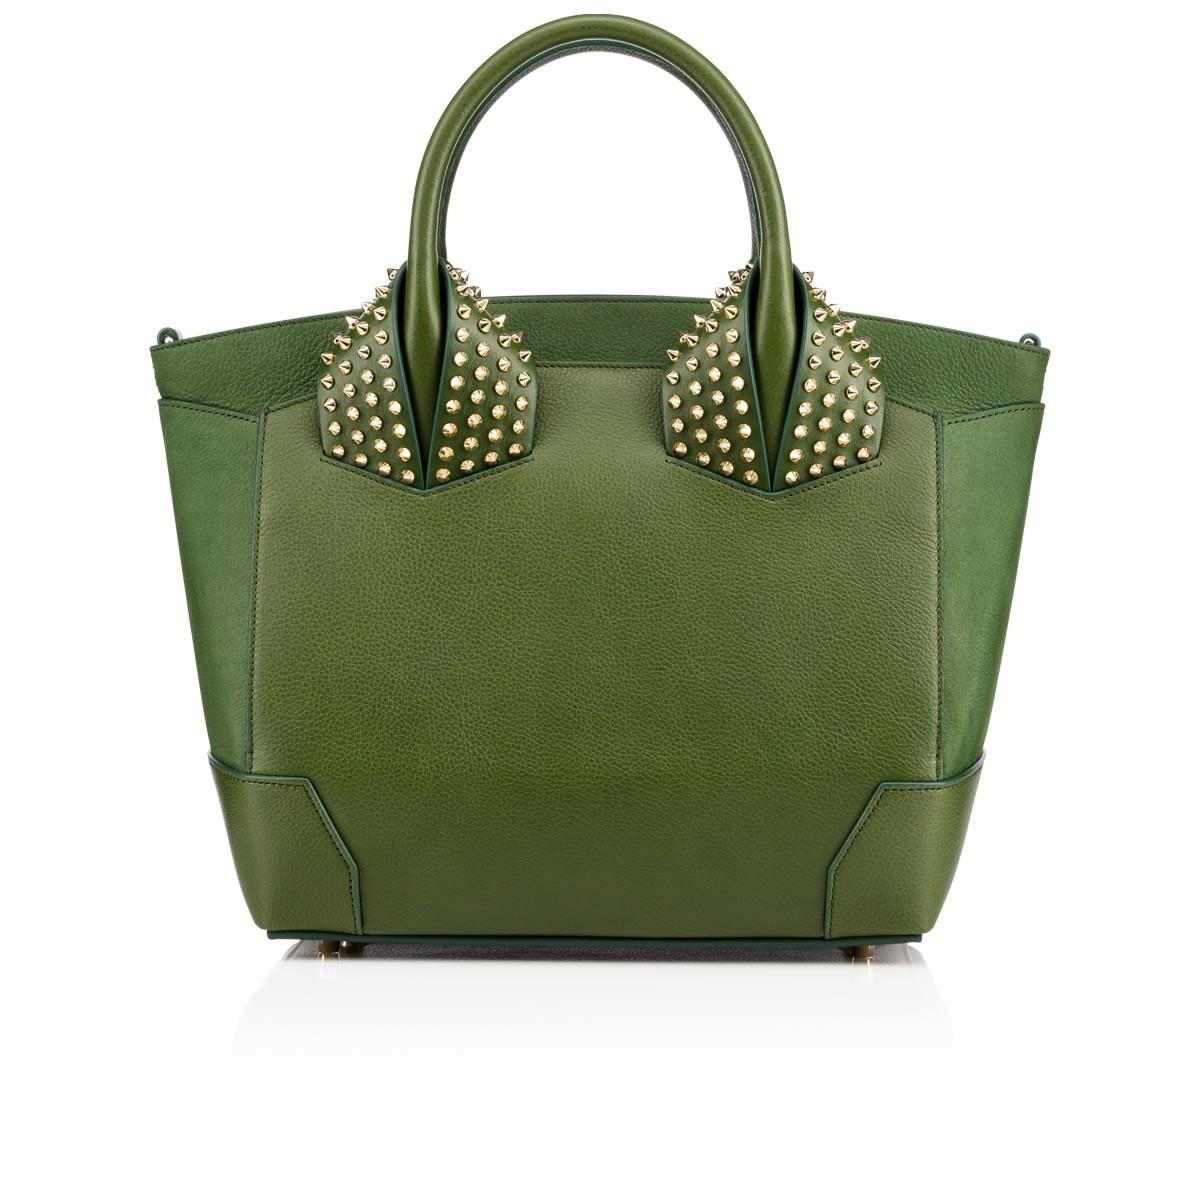 Foto de El nuevo 'it bag' de Christian Louboutin se llama 'Eloise' (6/8)